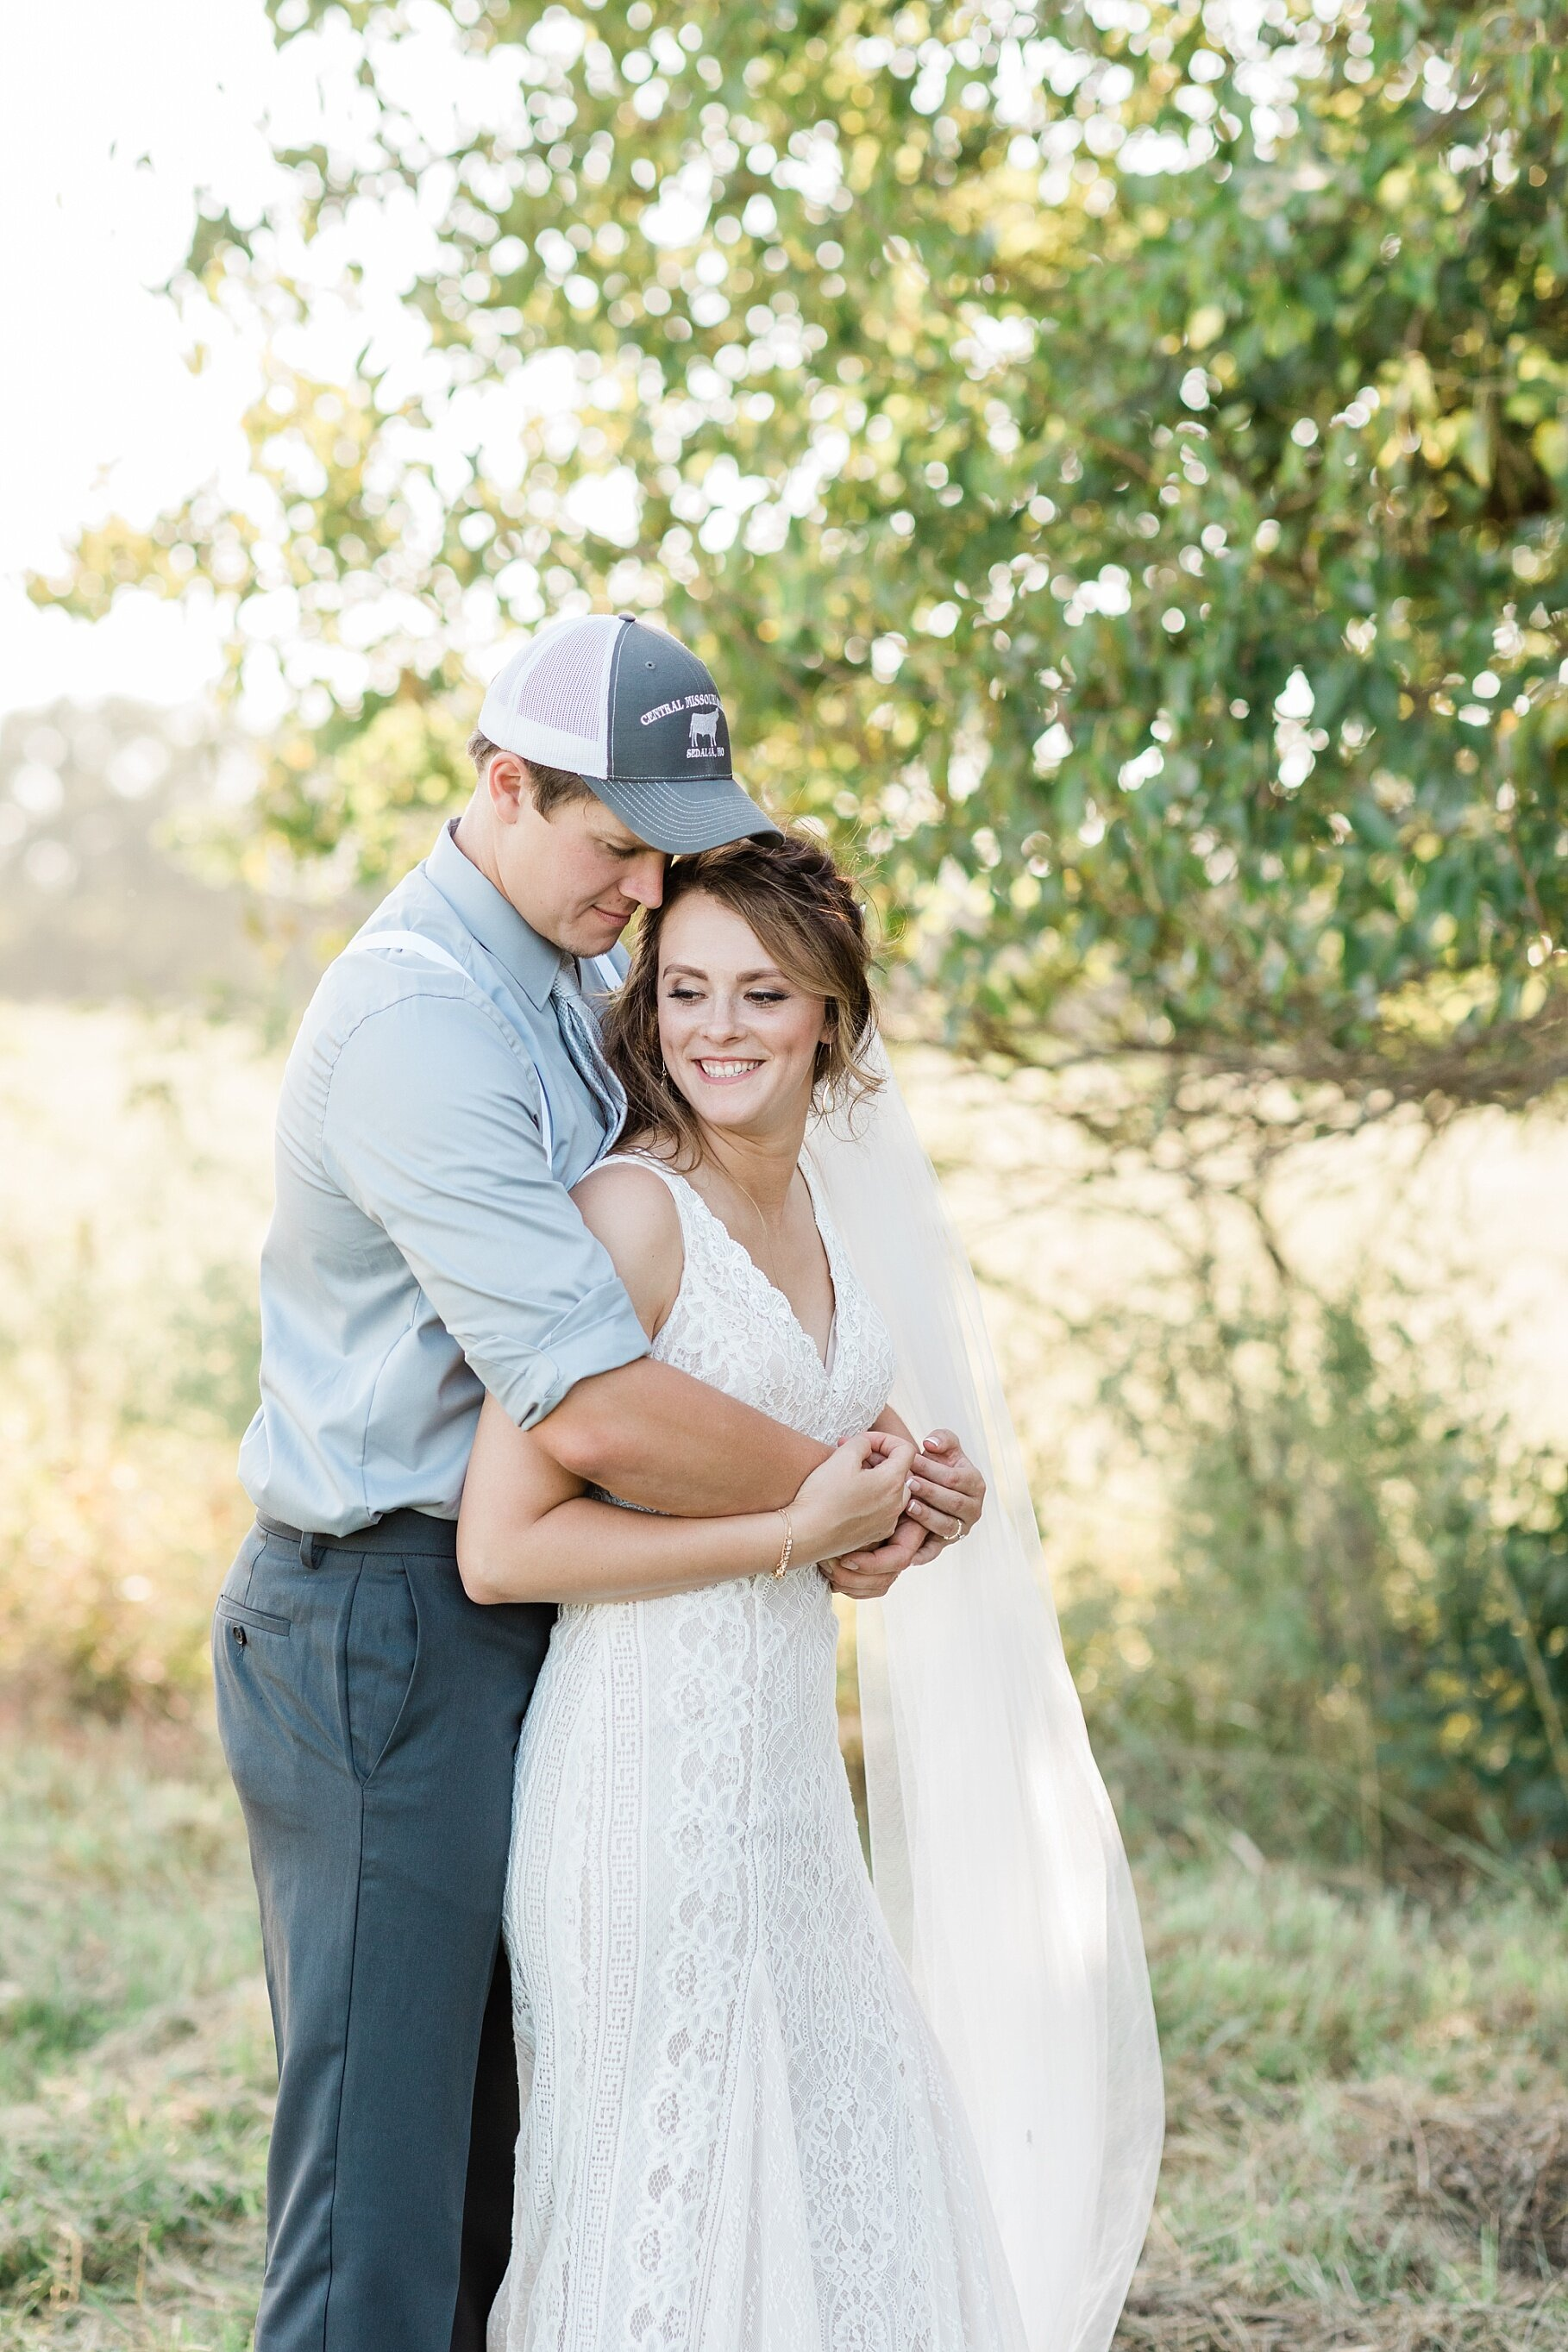 Earth-Toned Wedding by KKP Associate Wedding Photographer and Kelsi Kliethermes Photography Best Columbia Missouri Wedding Photographer_0010.jpg